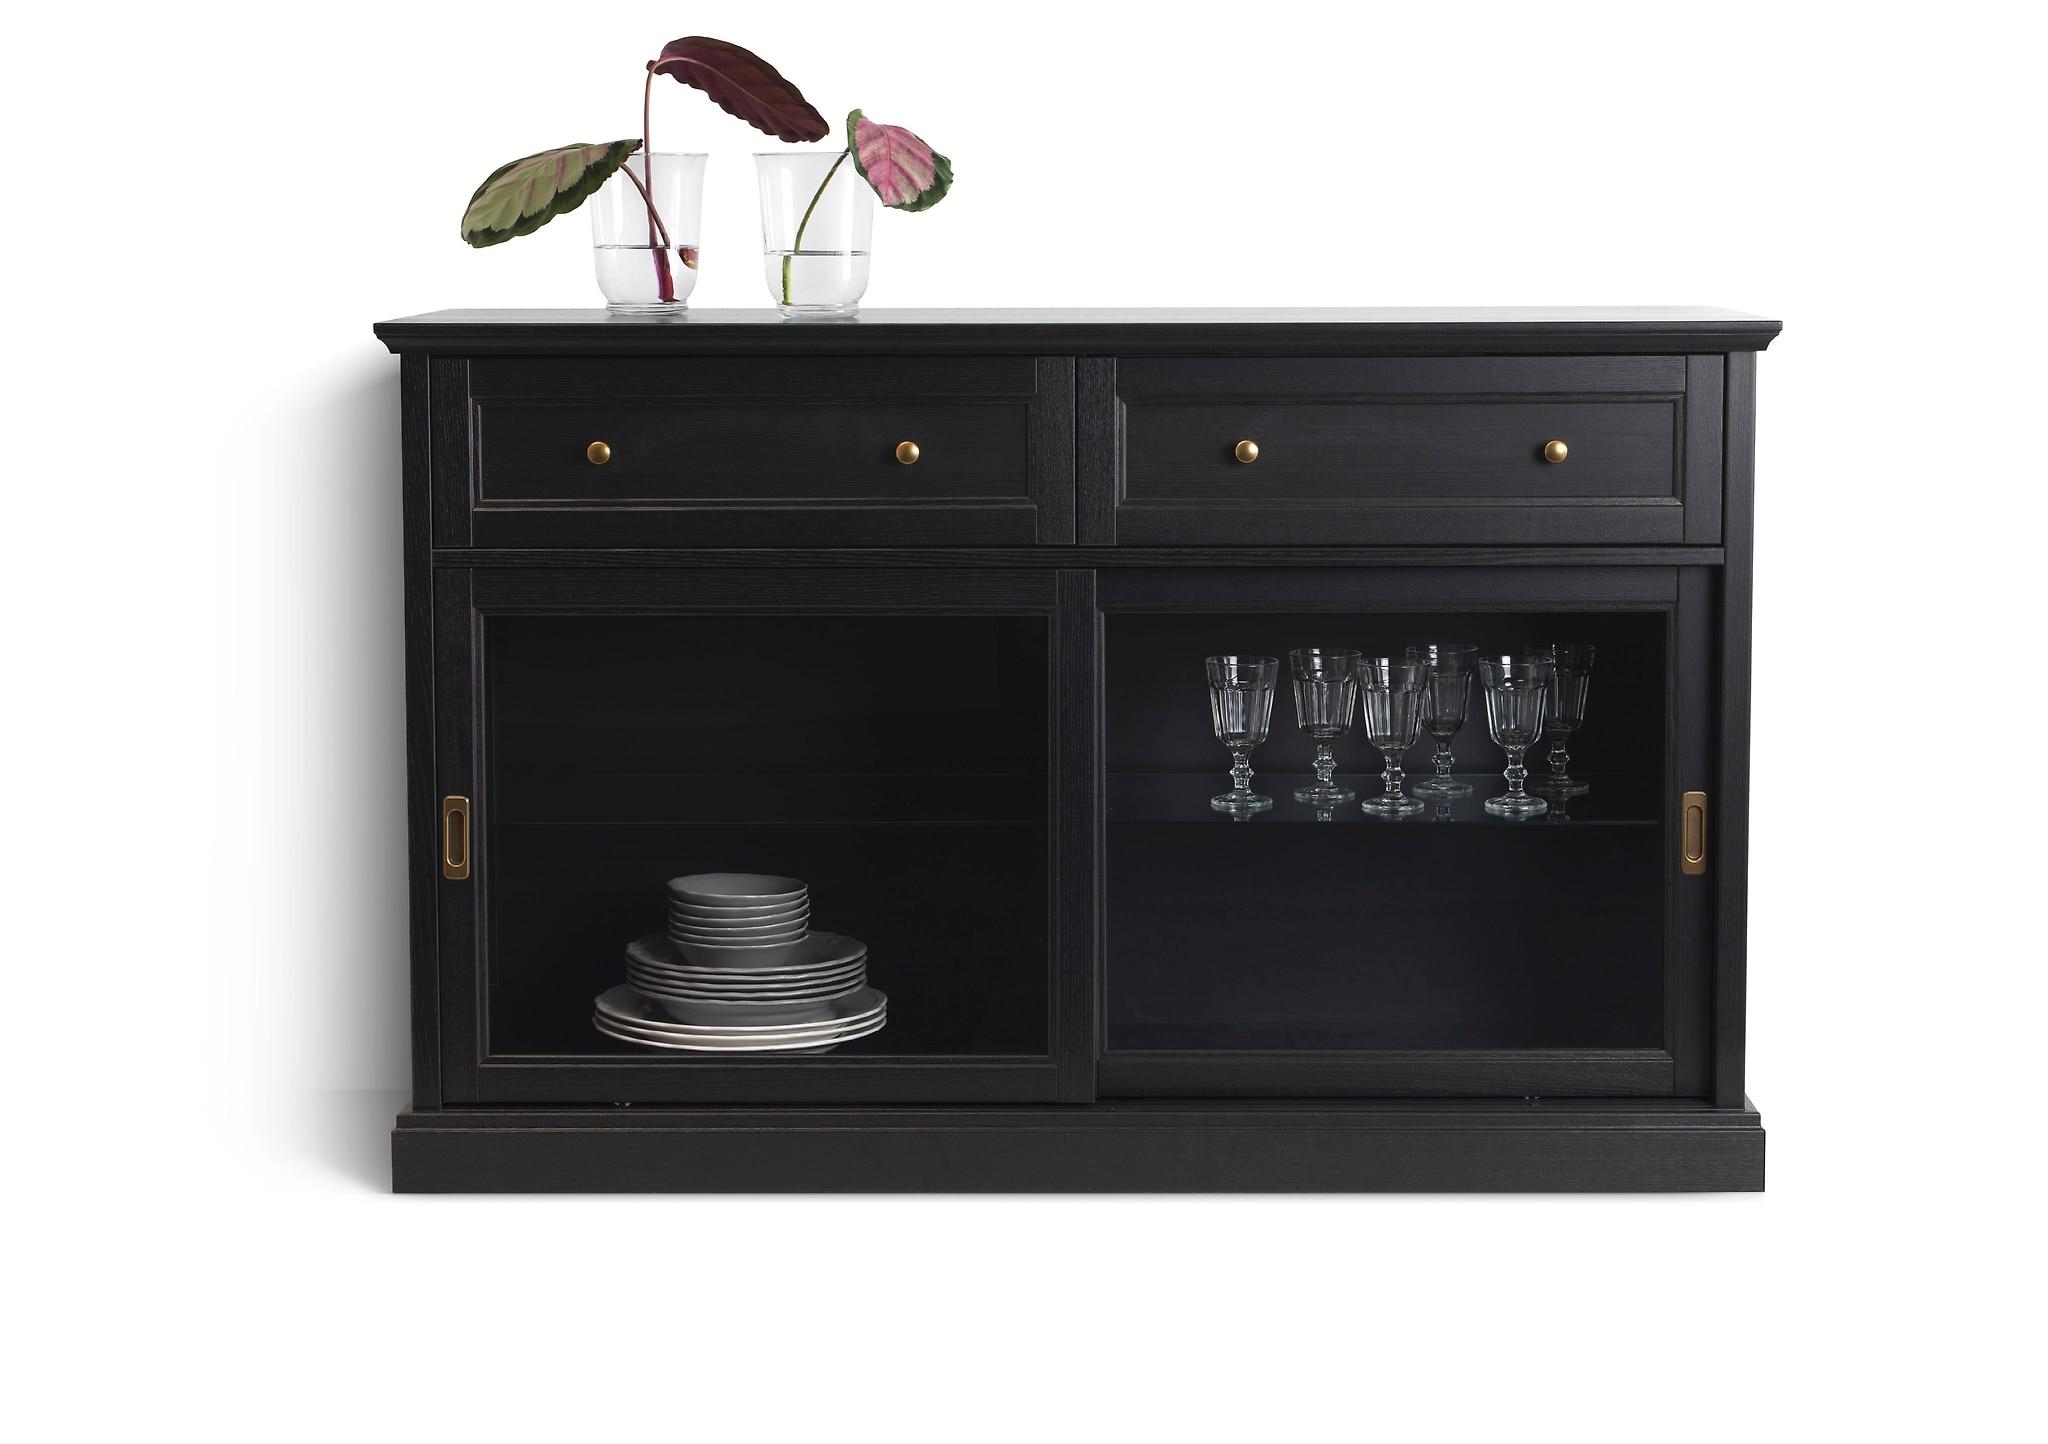 Mueble Consola Ikea 9ddf Armarios Aparadores Para Salà N O Edor Pra Online Ikea